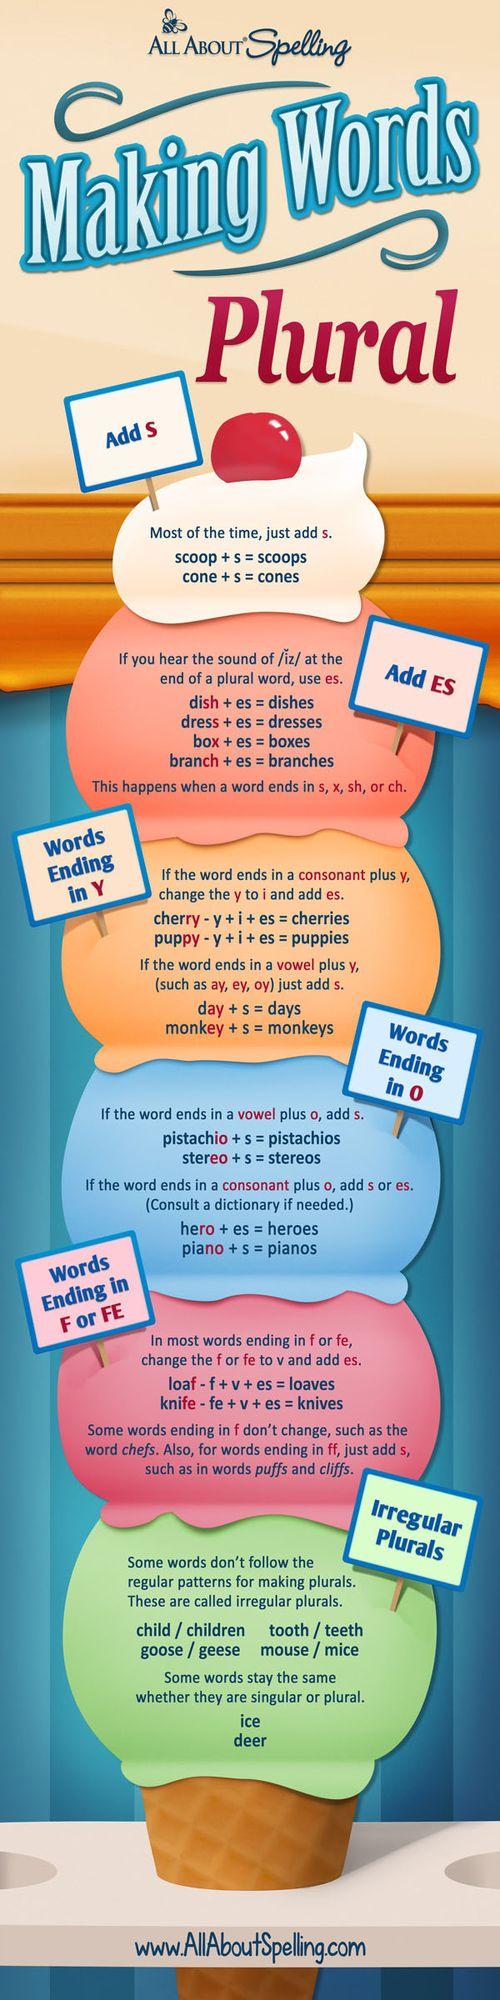 Spelling tips and tricks making words plural all about learning spelling tips and tricks making words plural via bloglovin fandeluxe Images